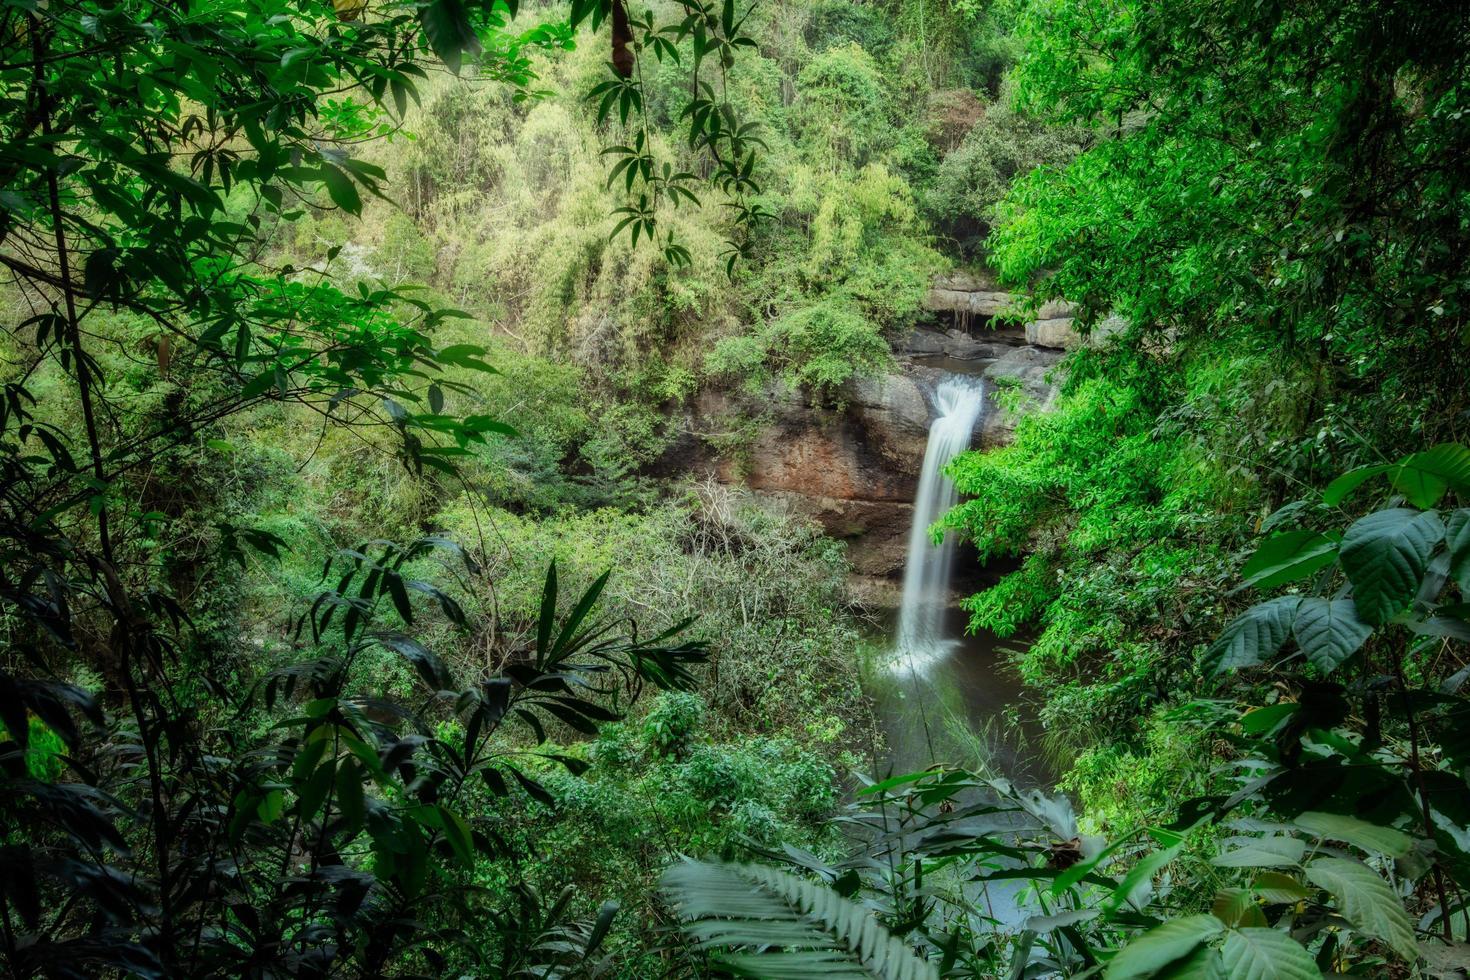 det haew suwat vattenfallet foto